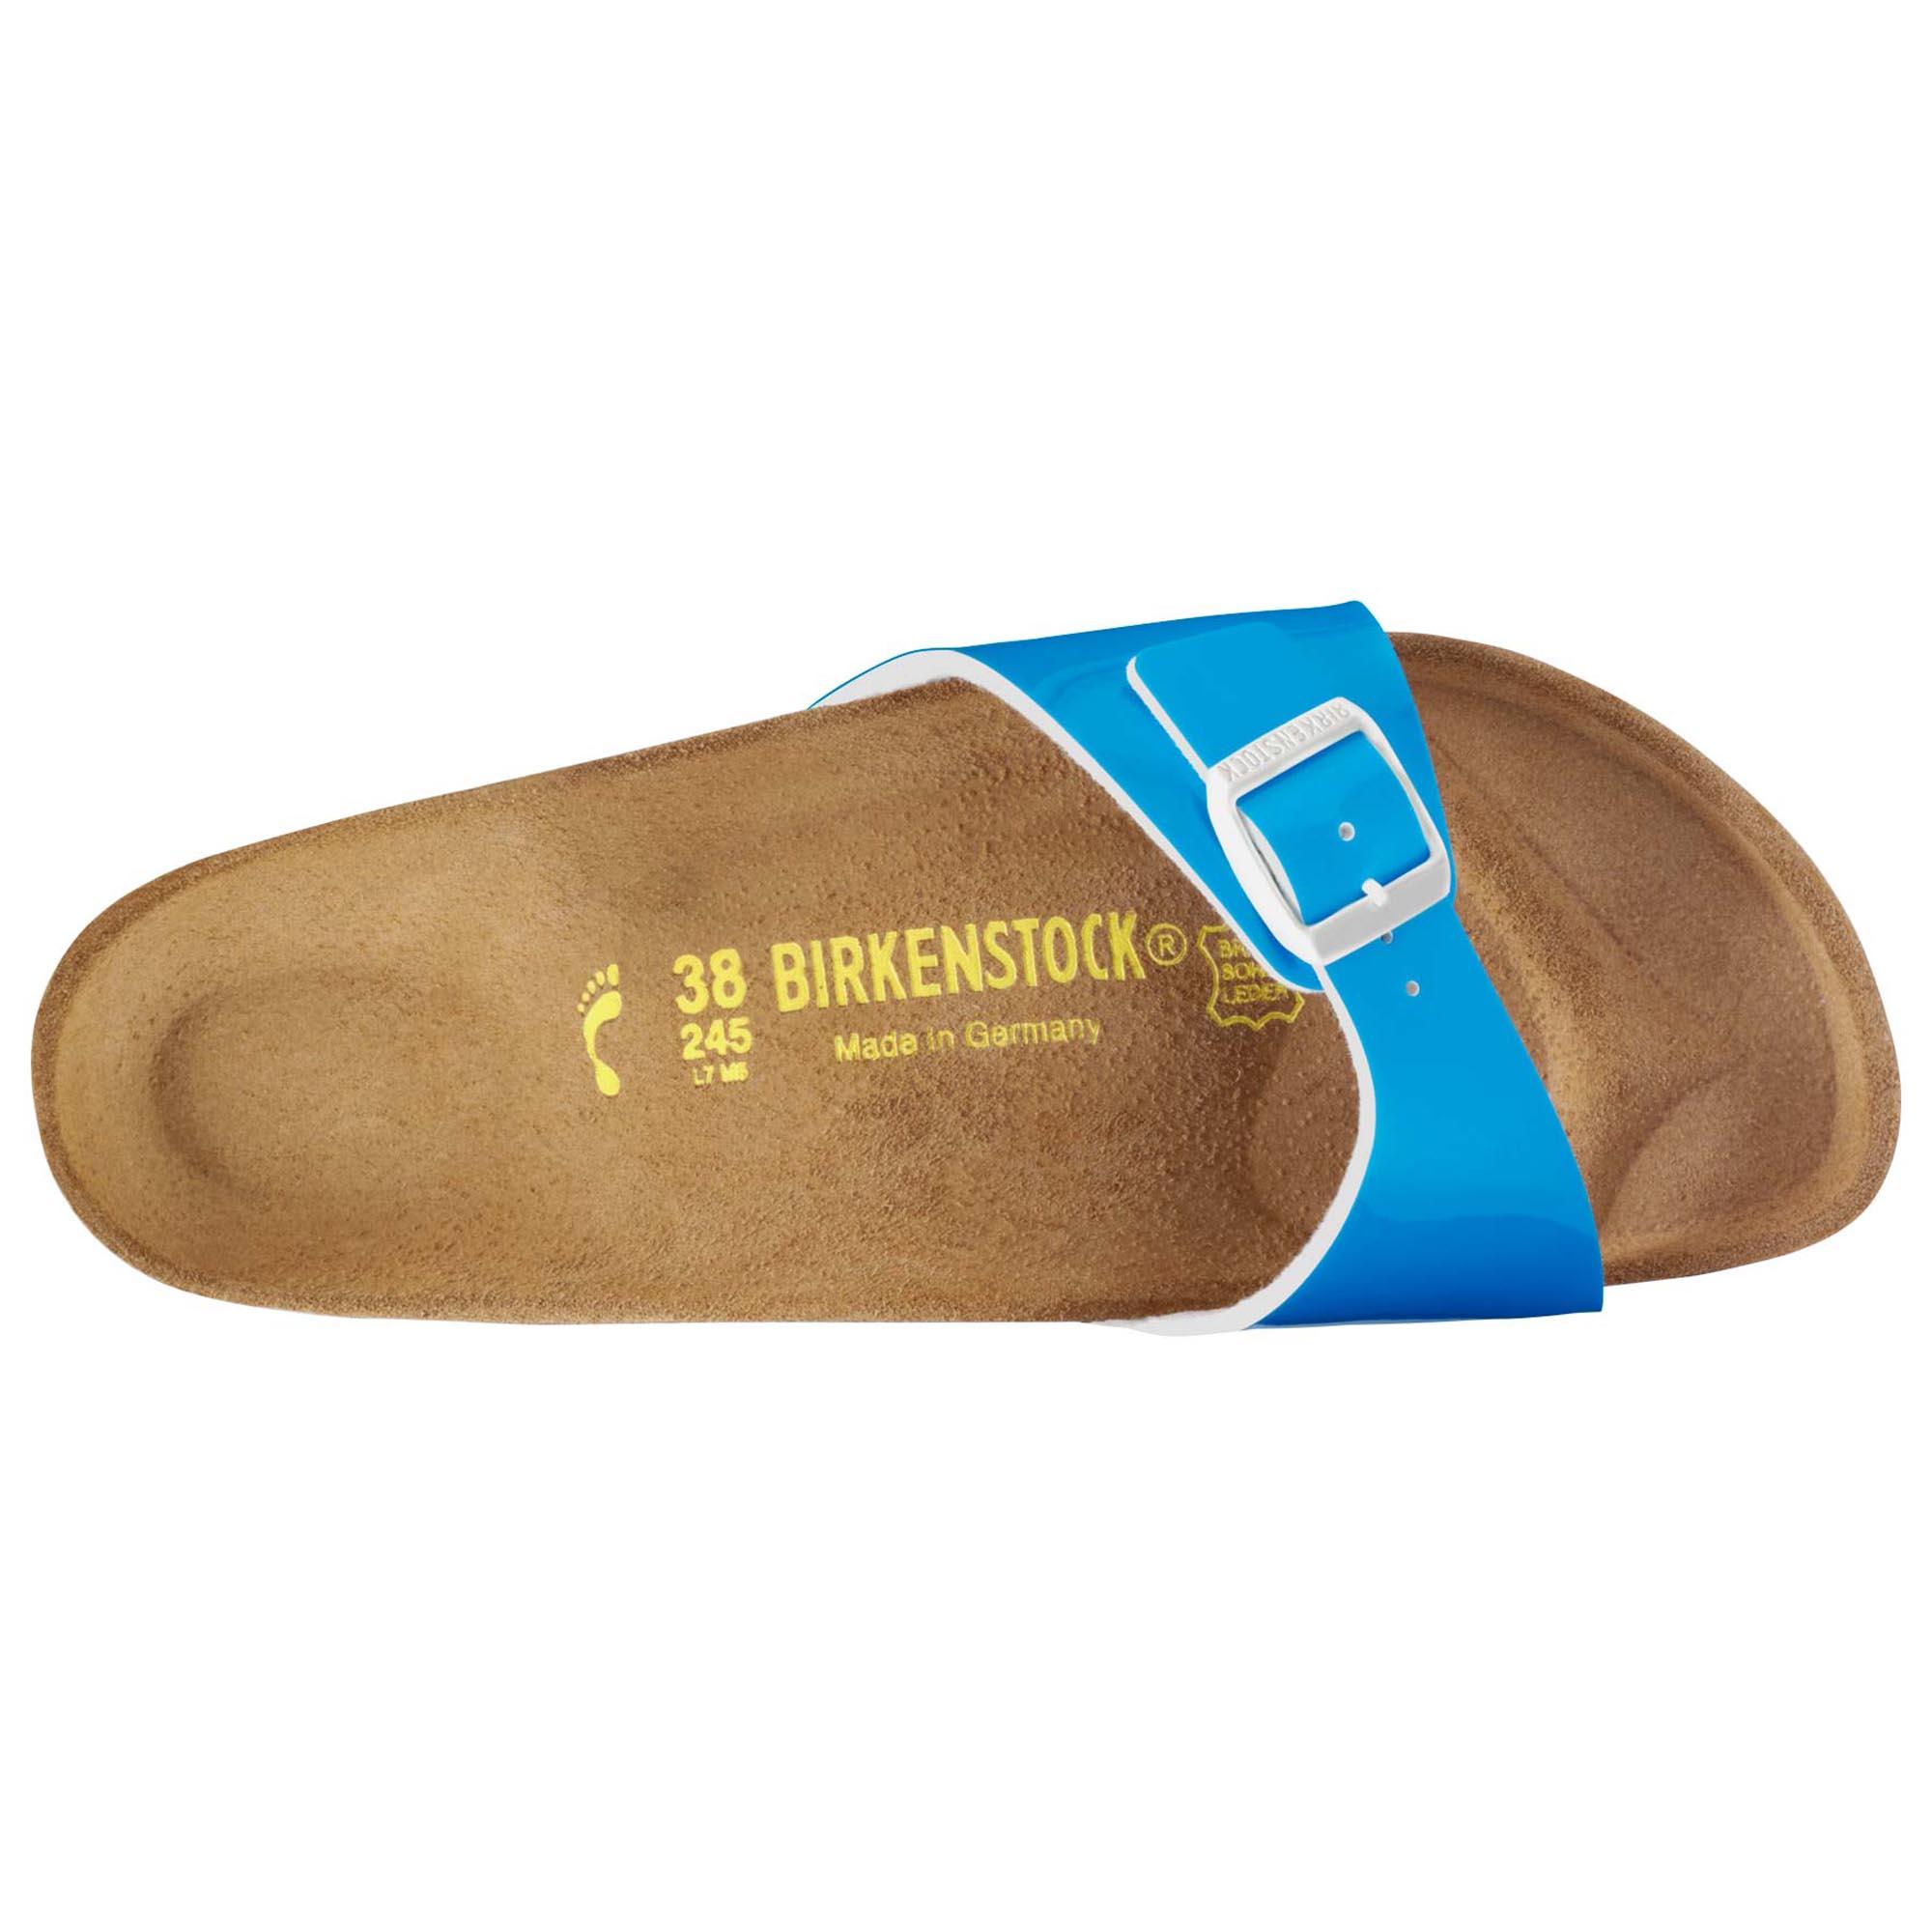 Birkenstock Madrid Pantent Bleu Néon QMp1zof